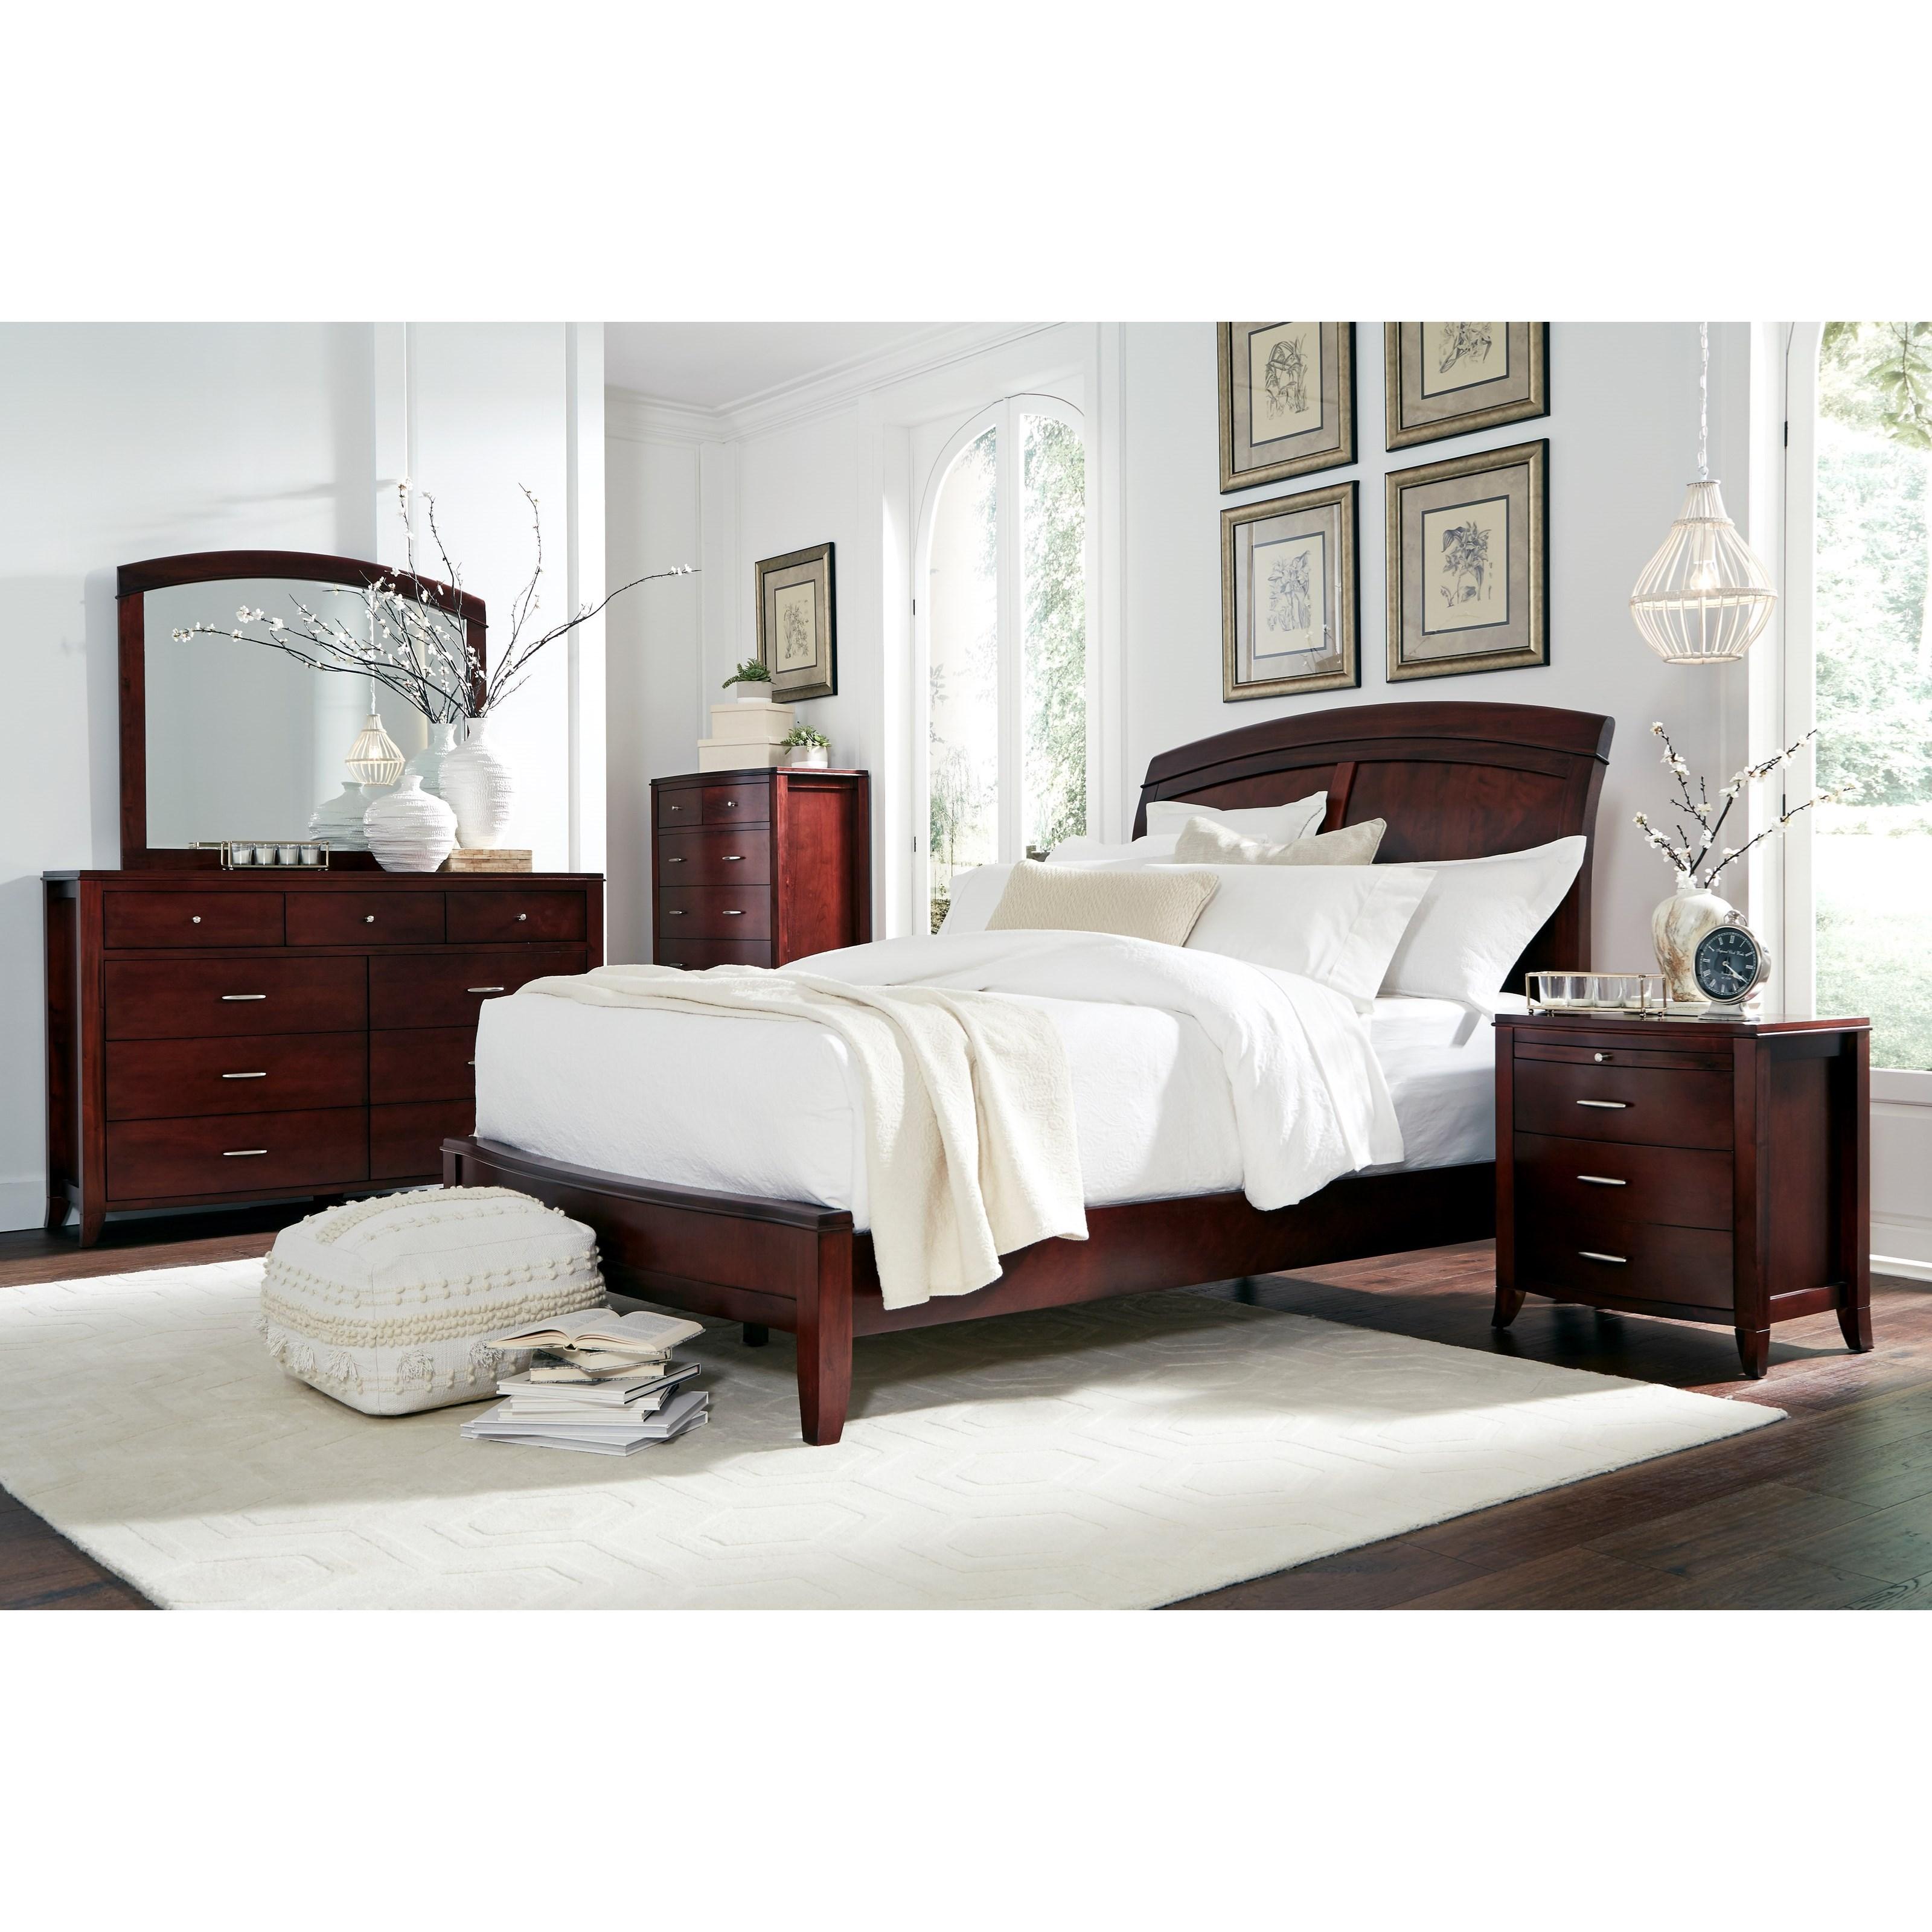 Brighton California King Bedroom Group at Sadler's Home Furnishings